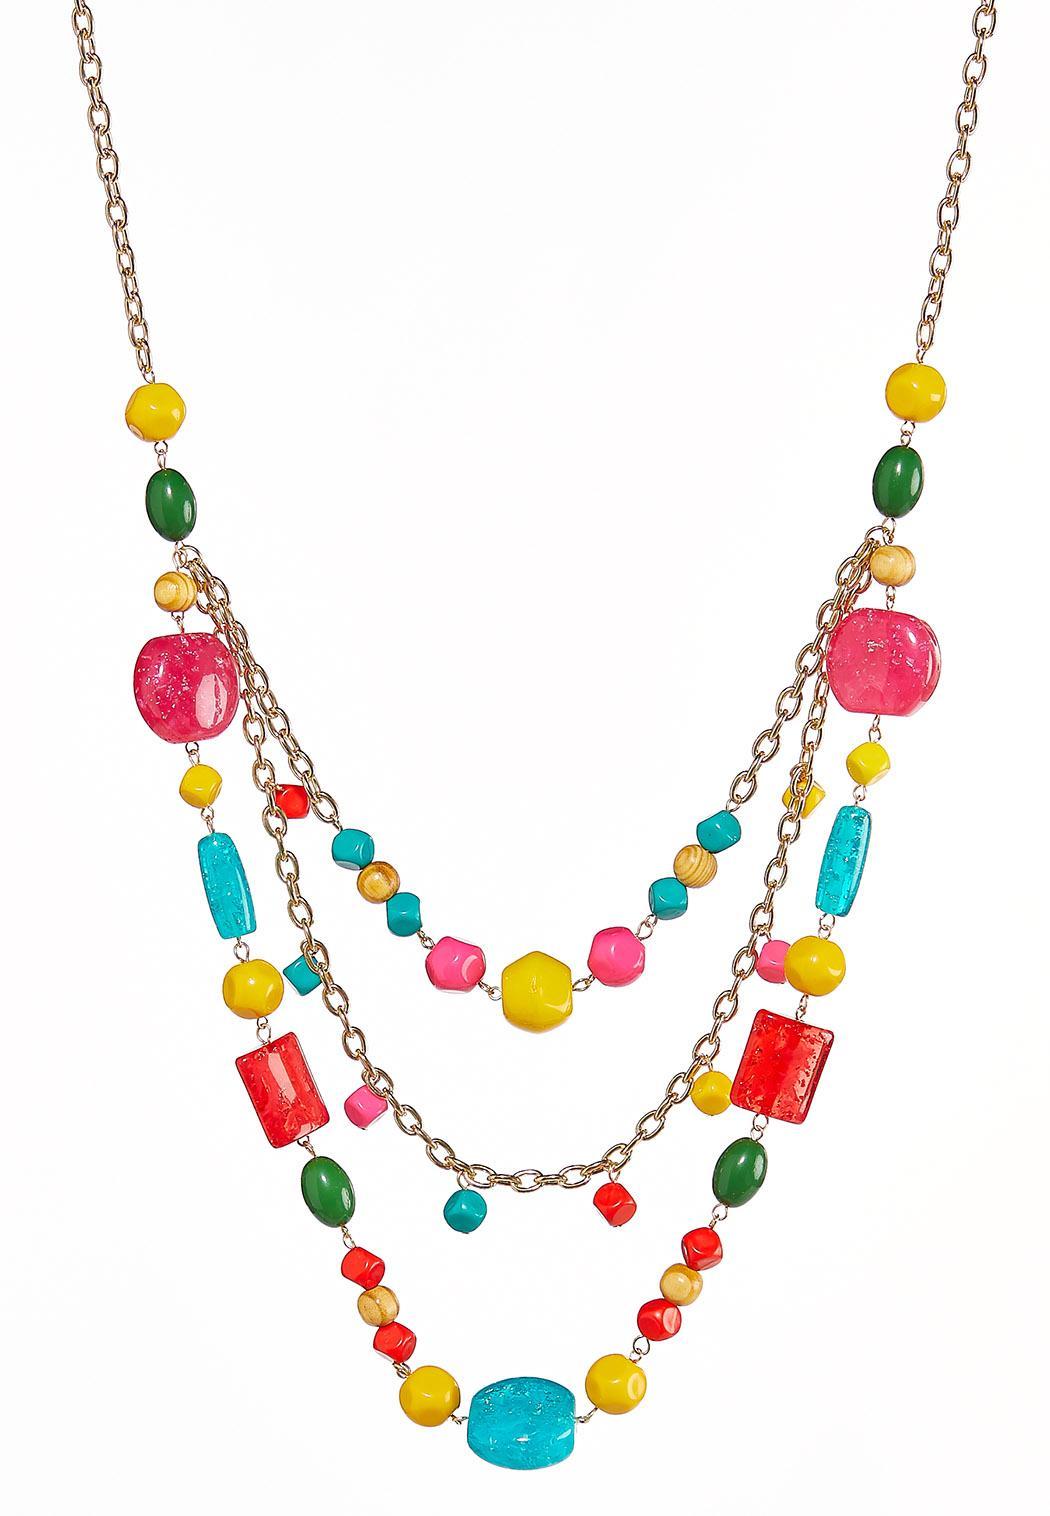 Layered Rainbow Necklace